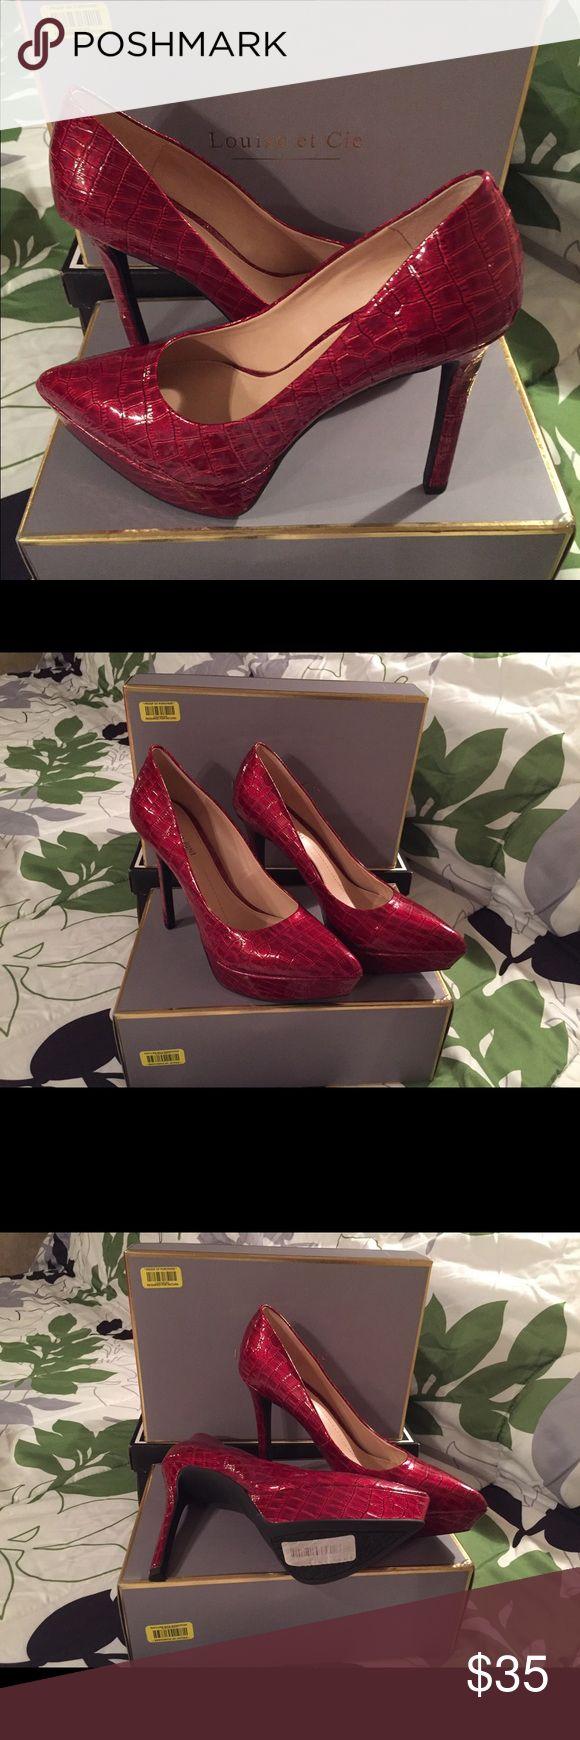 Pretty in Red high heel shoe New never worn. Gianni Bini Shoes Heels